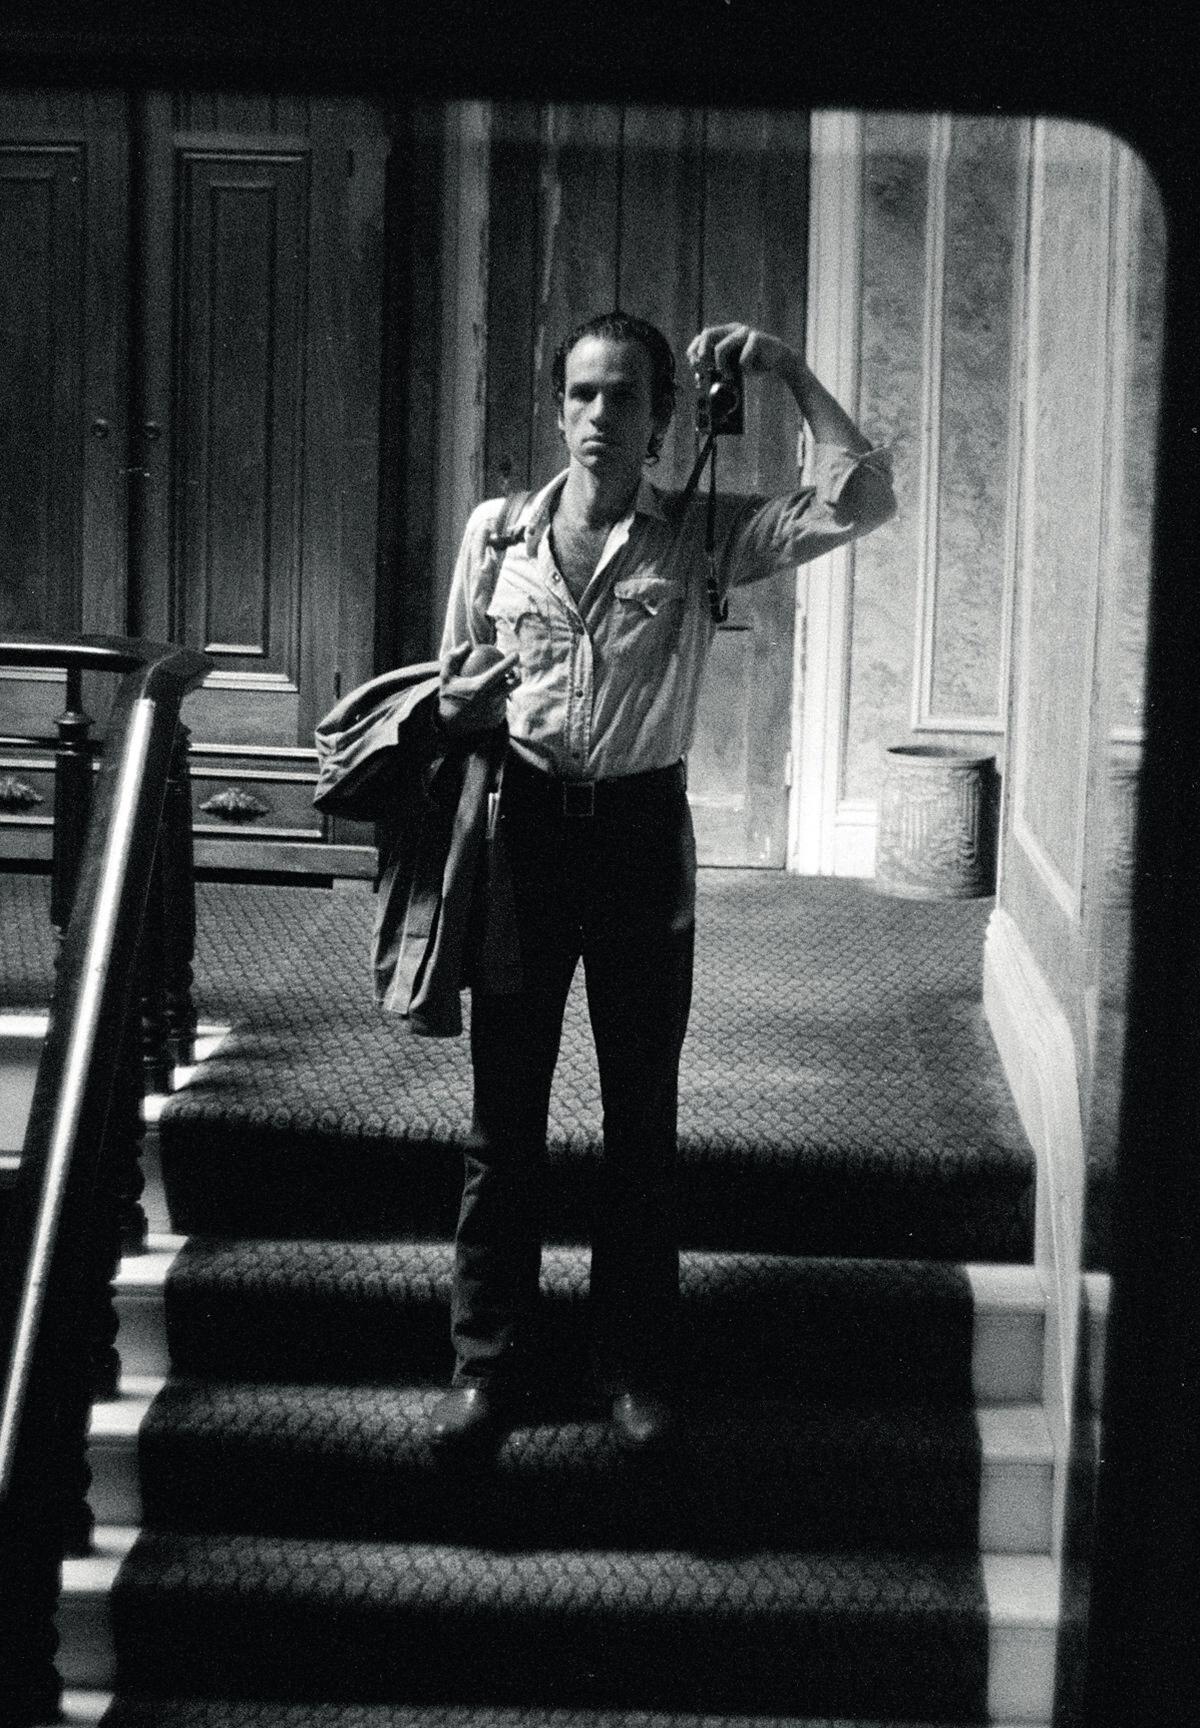 Joel Meyerowitz, Self-Portrait, 1971. © Joel Meyerowitz. Courtesy of the artist and Laurence King Publishing.